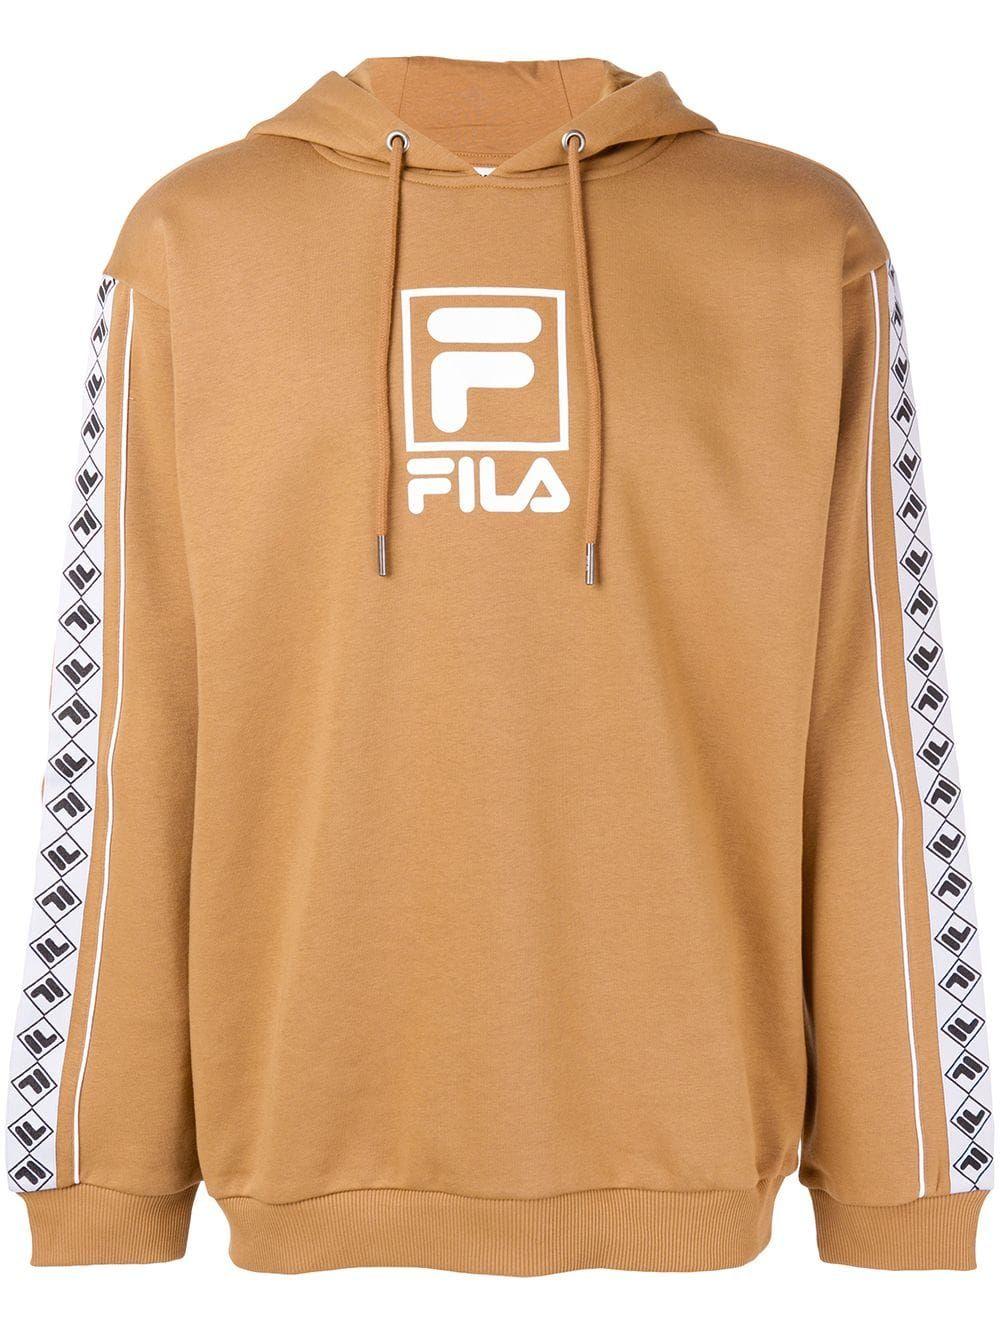 b3a874c9c7ff FILA FILA CONTRAST LOGO HOODIE - NEUTRALS.  fila  cloth